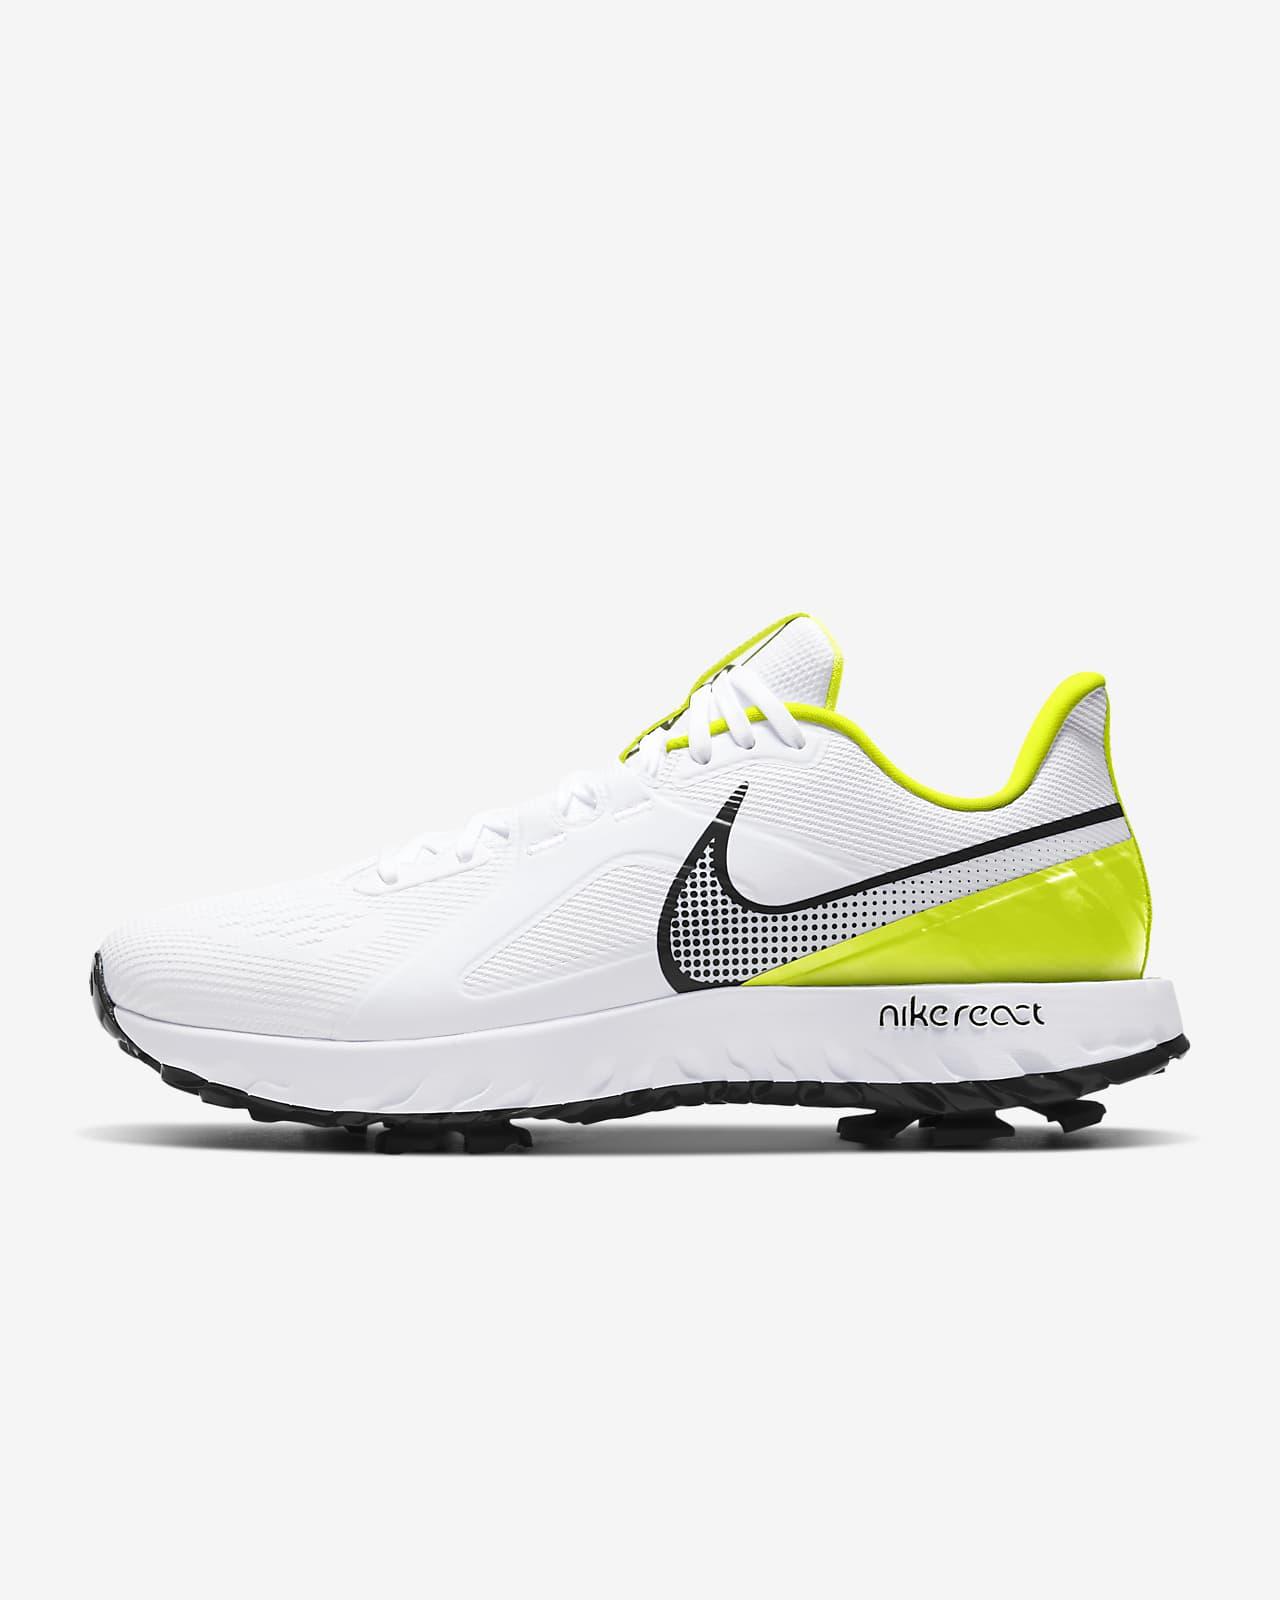 nike tour pro golf shoes